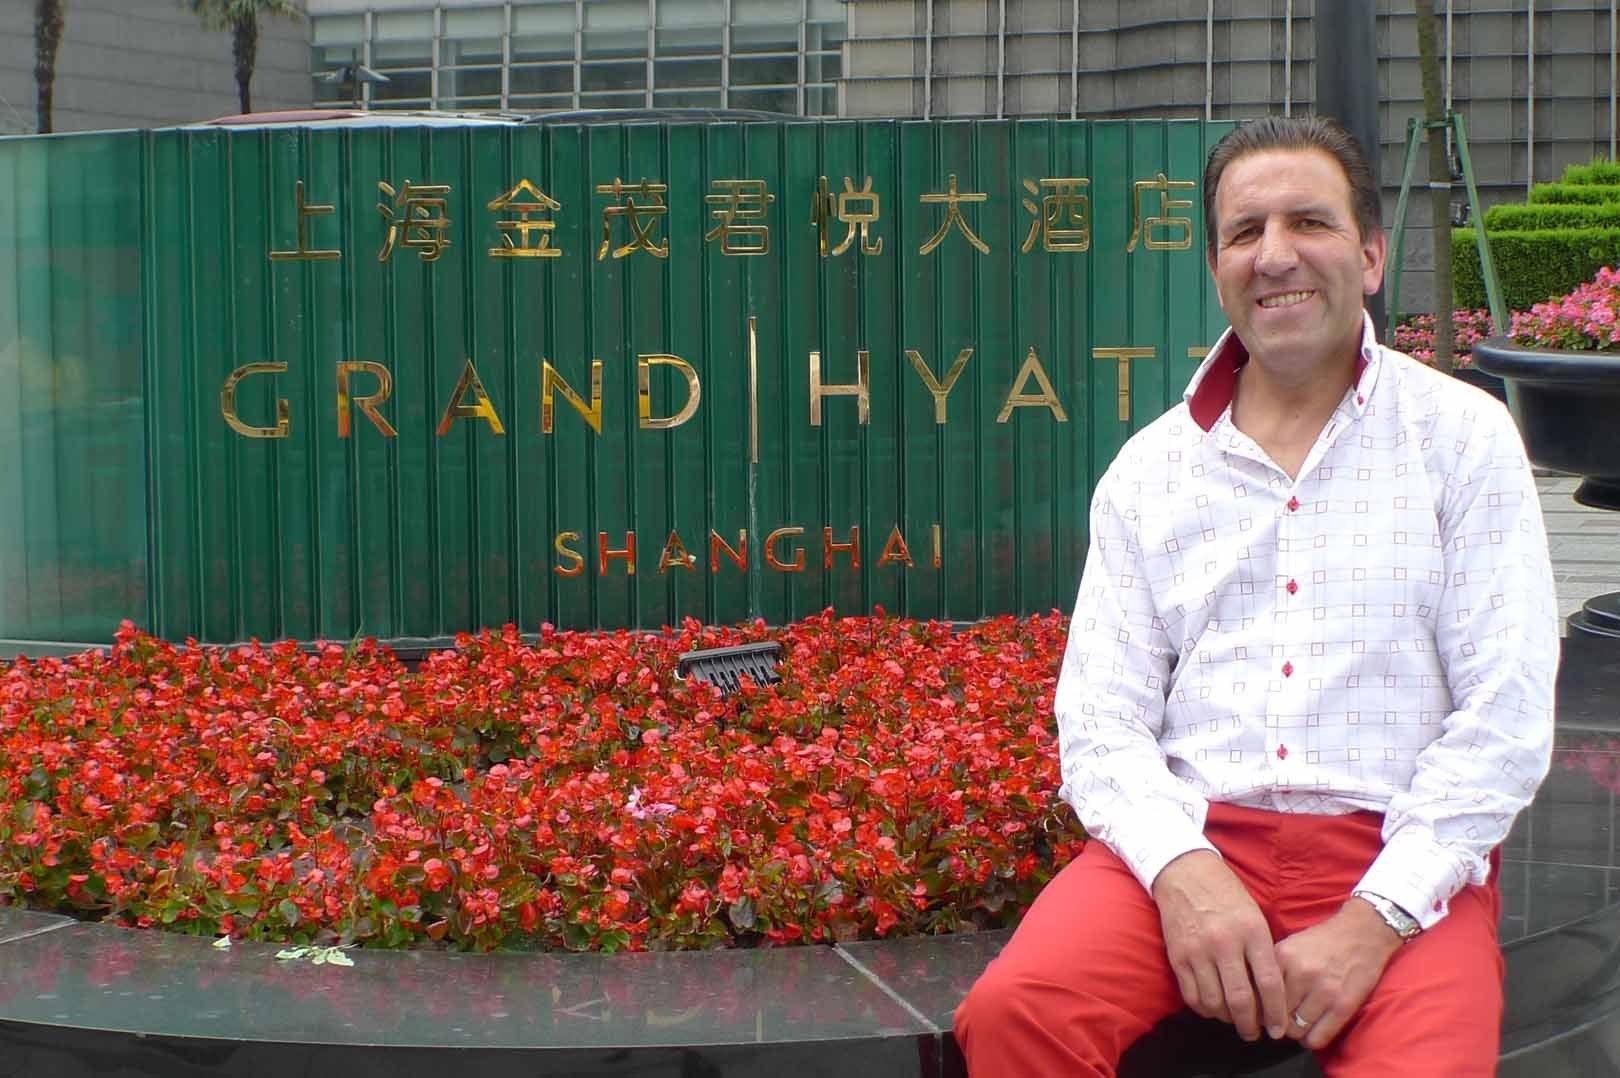 Shanghai_Hotel_Grand-Hyatt_008